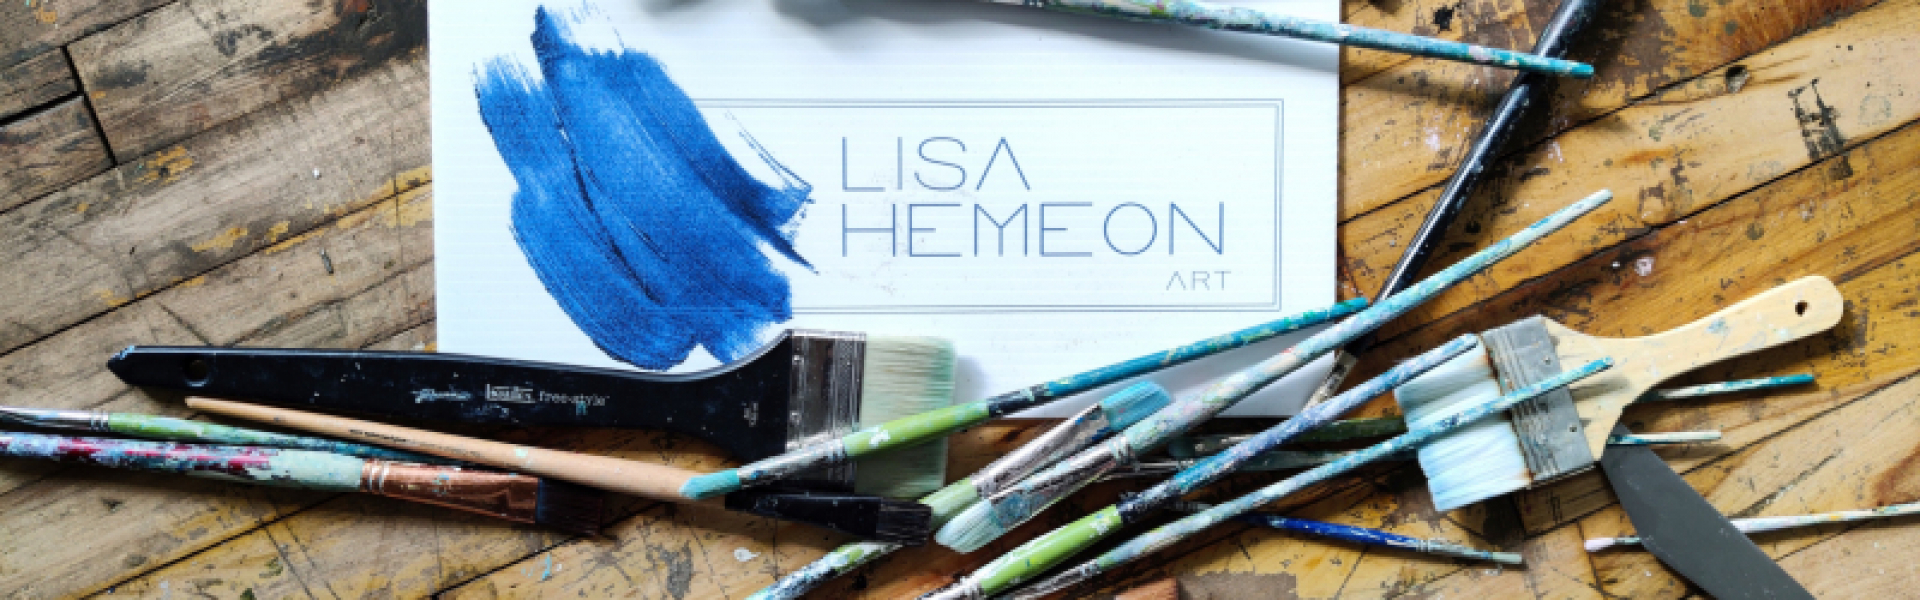 banner_Lisa-logo-and-brushes-May2021-V1.20210516165113.jpg